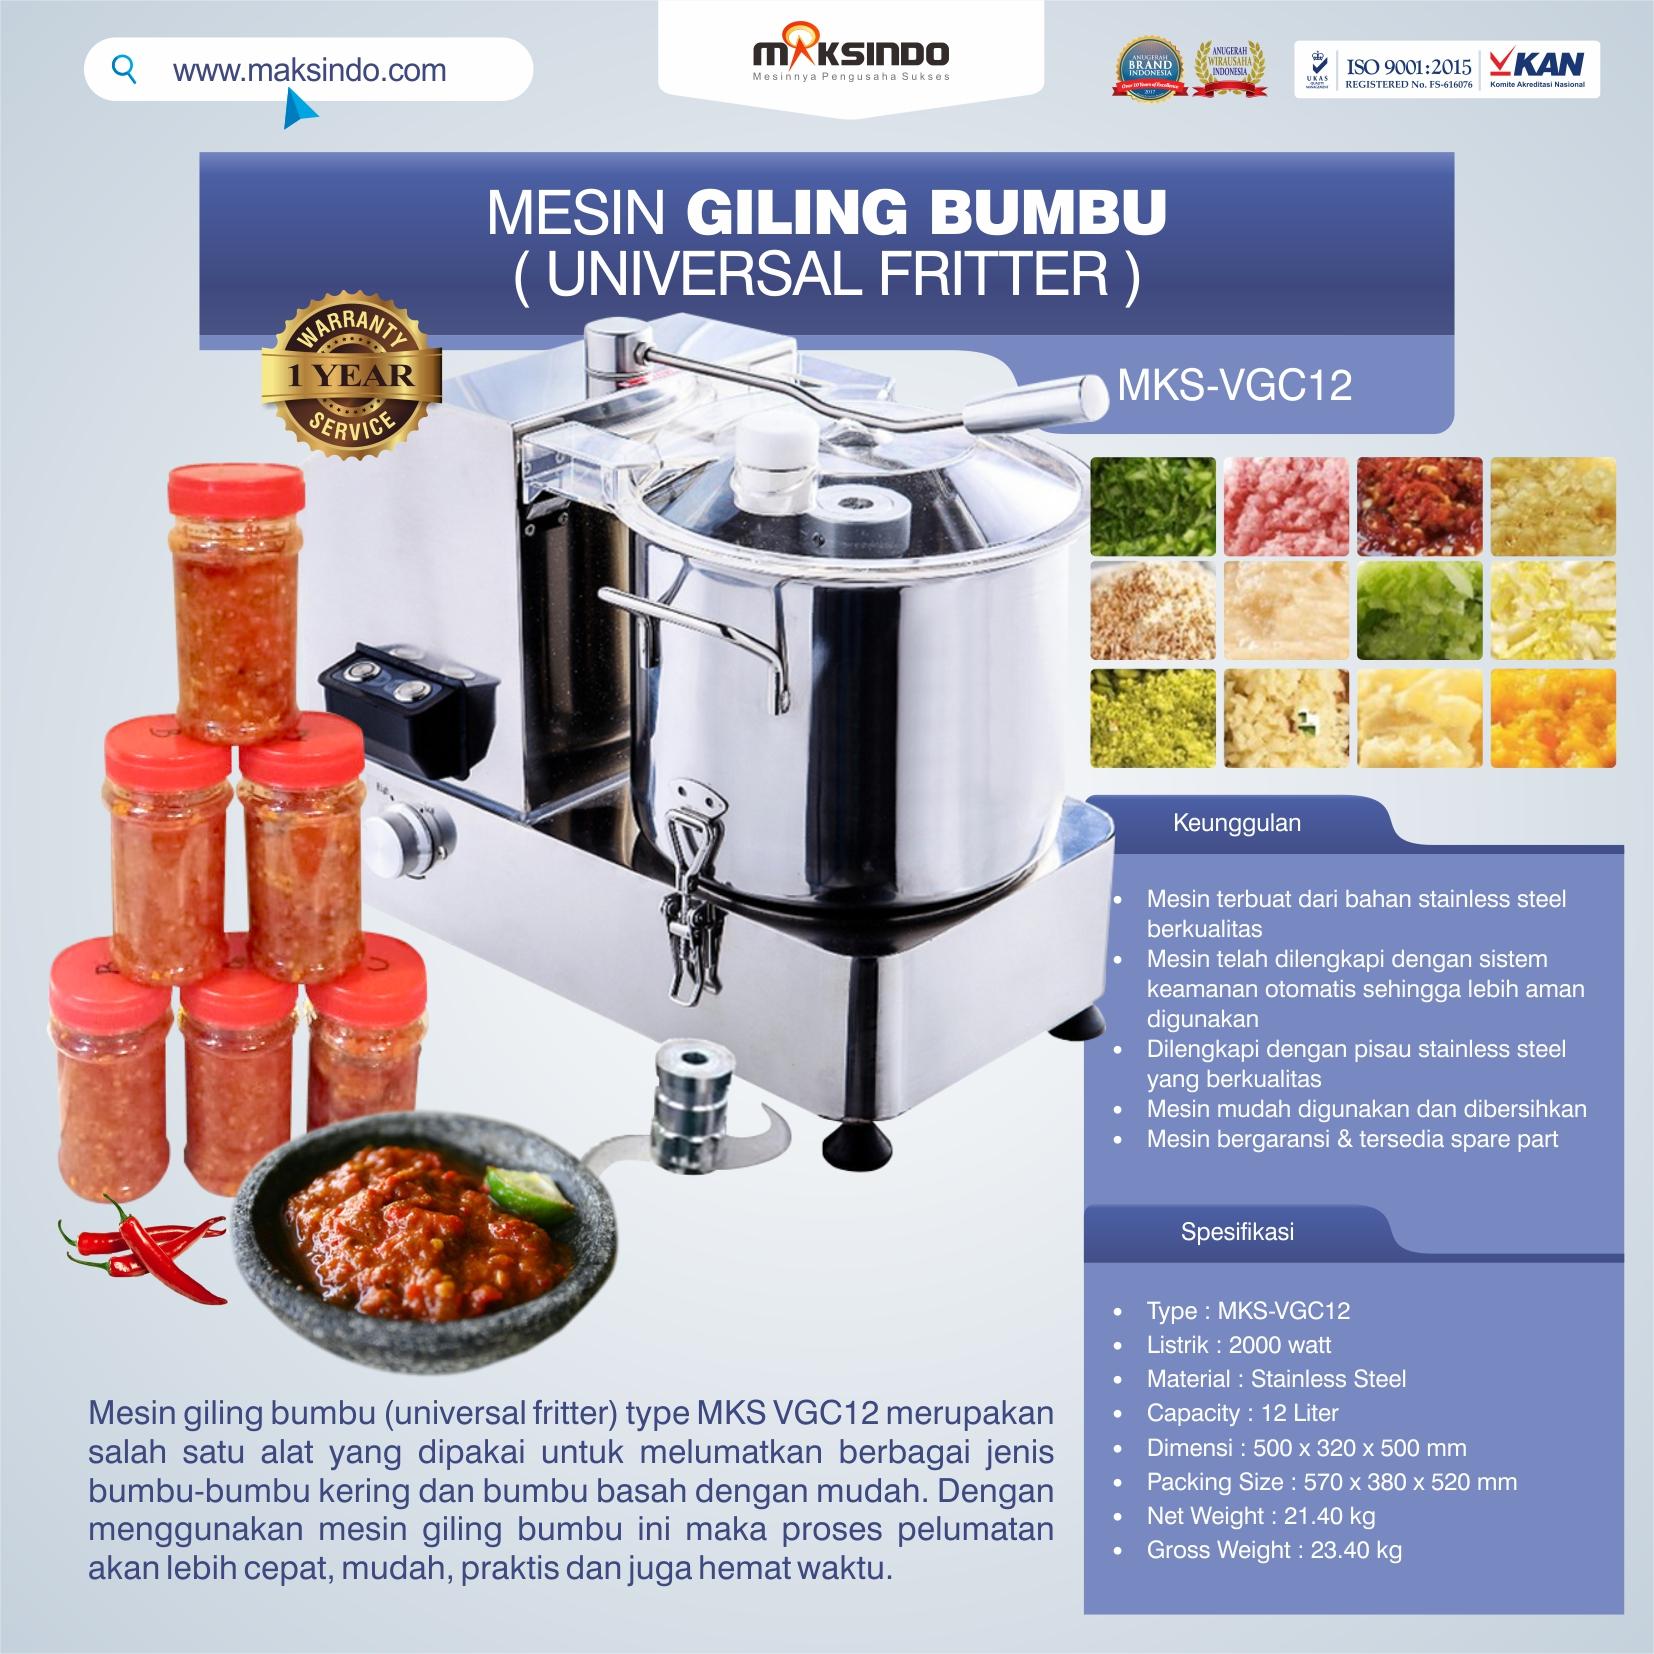 Jual Mesin Giling Bumbu (Universal Fritter) MKS VGC12 di Bandung